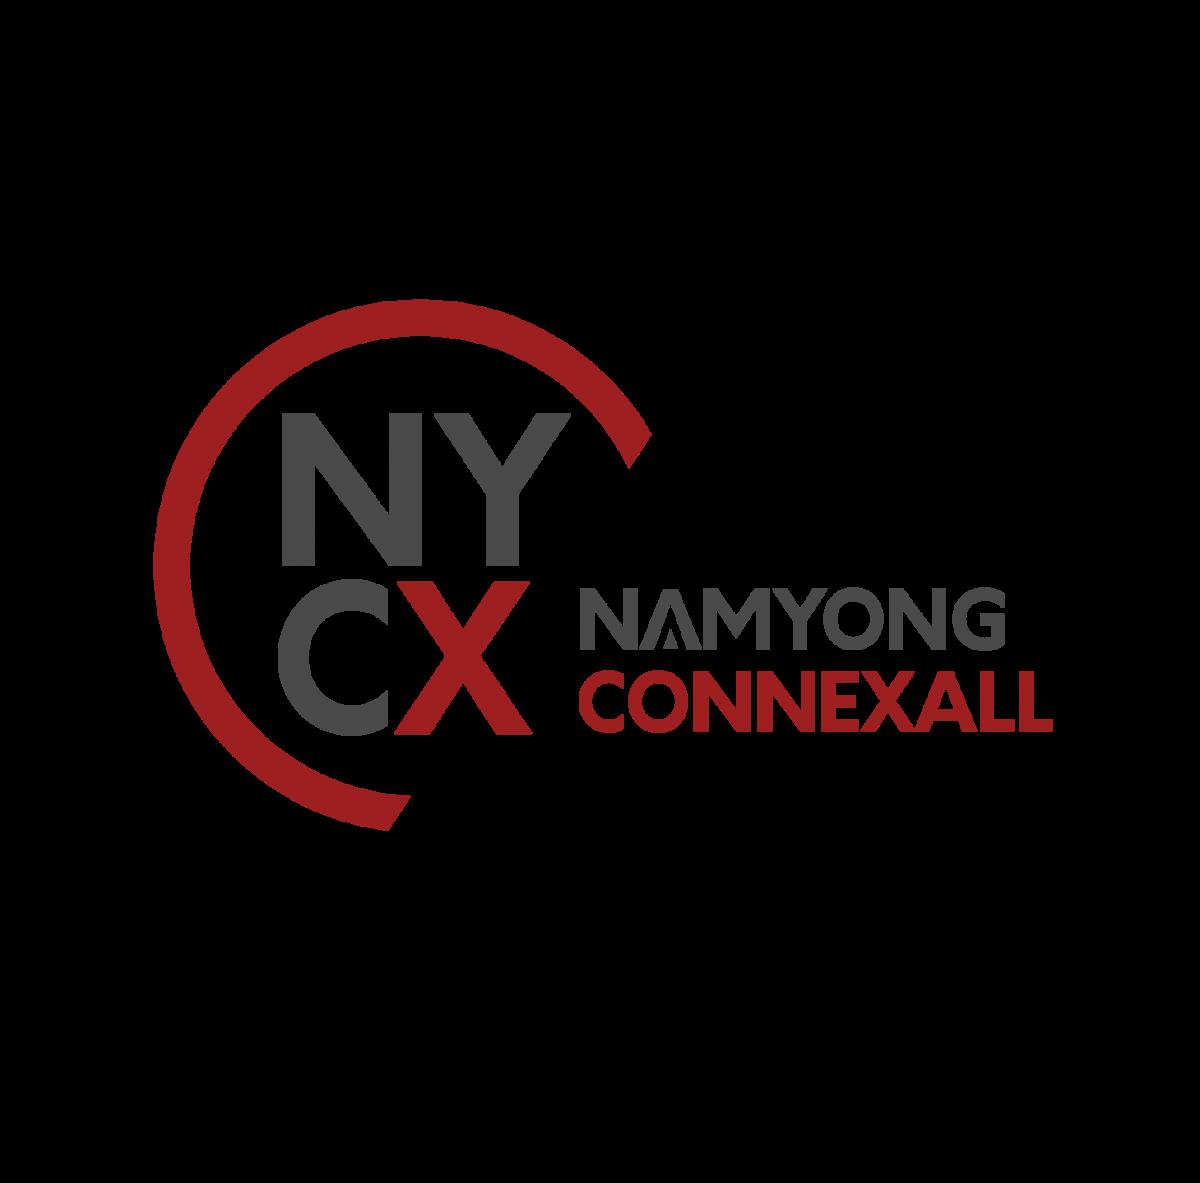 Namyong-Connexall-1200x1183.png